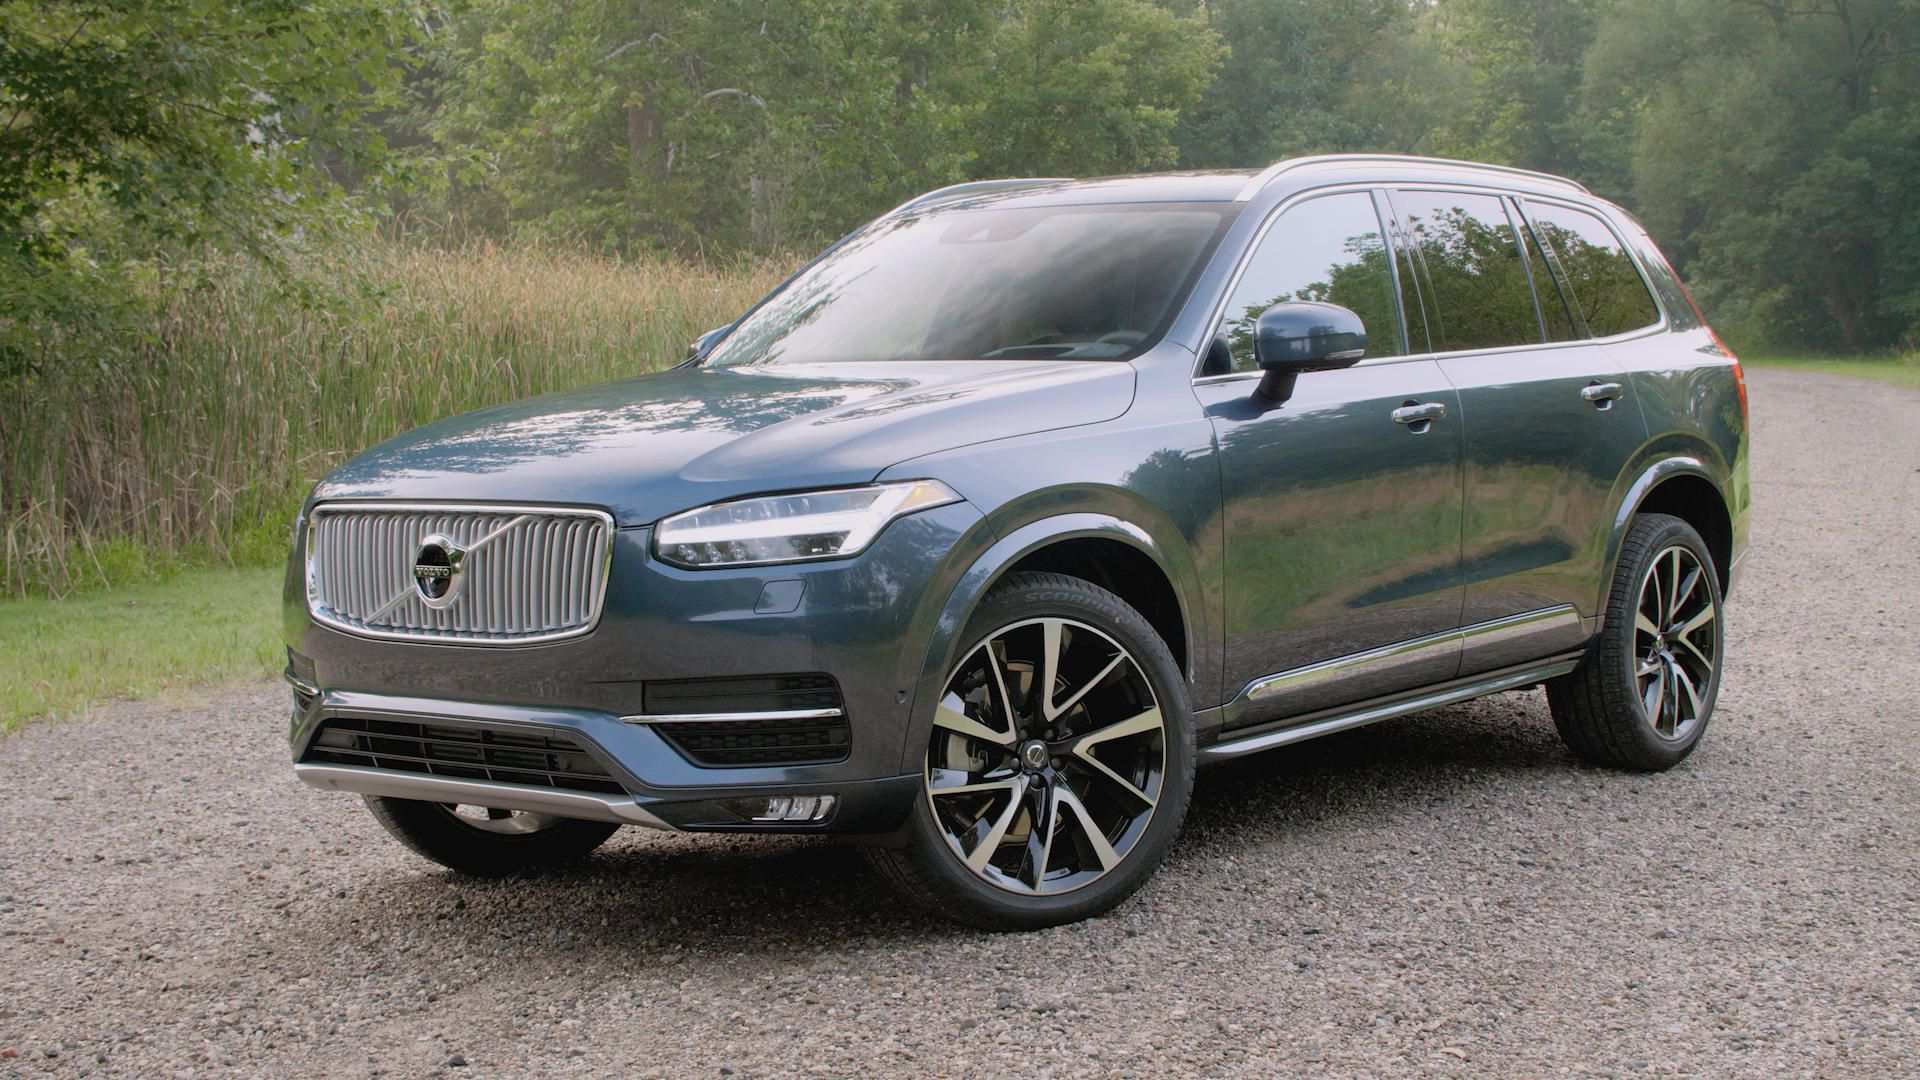 33 Concept of Volvo Modellar 2019 Rumor Redesign by Volvo Modellar 2019 Rumor